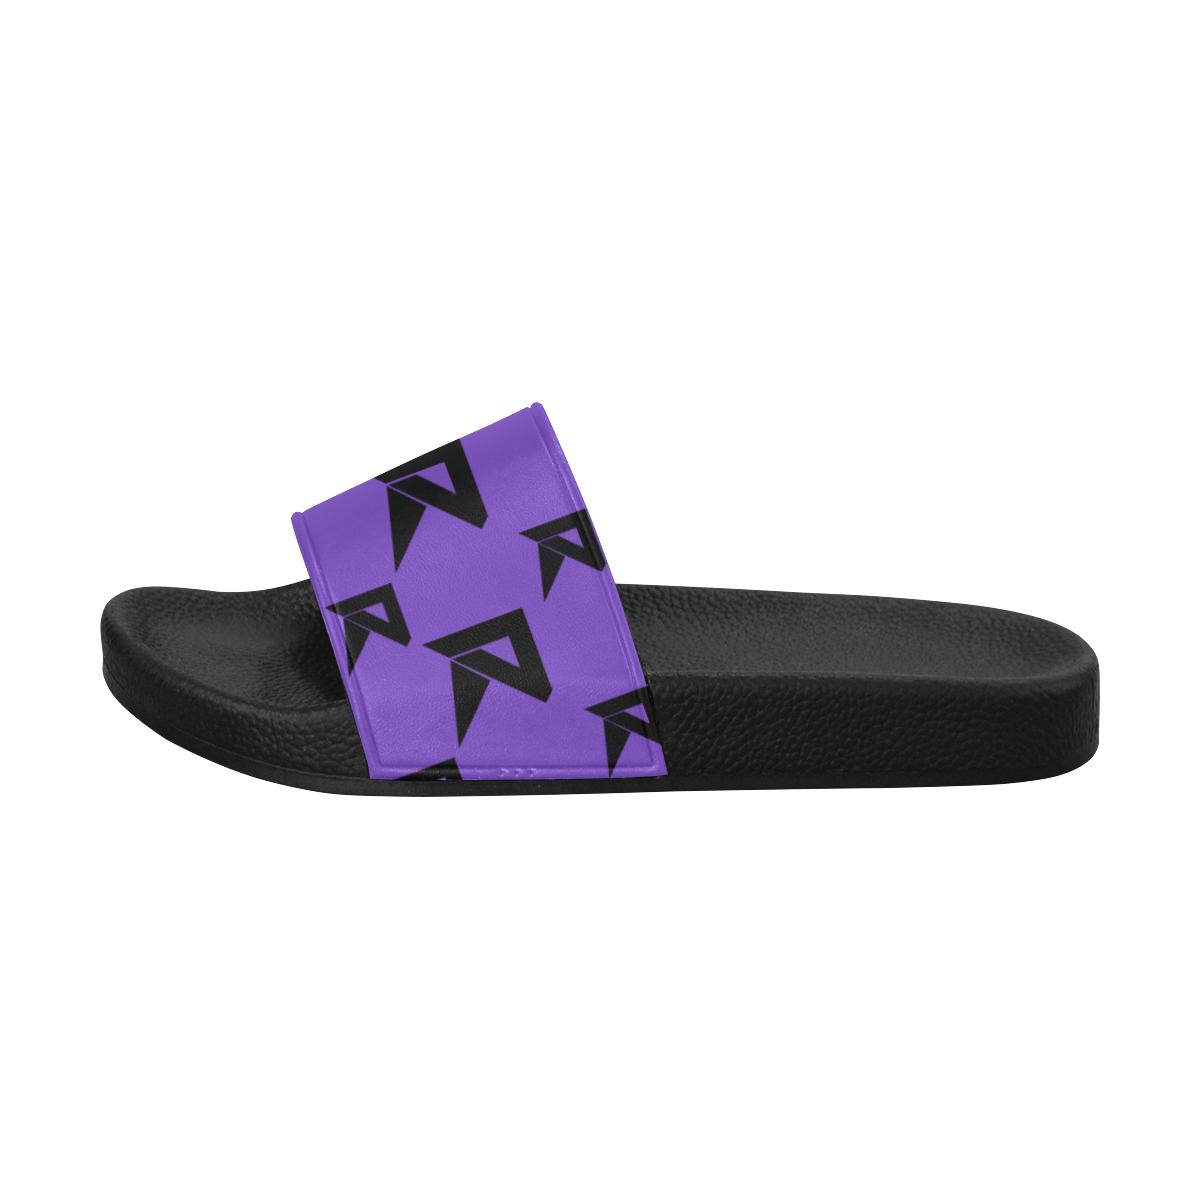 Women's Slide Sandals (Purple) Women's Slide Sandals (Model 057)